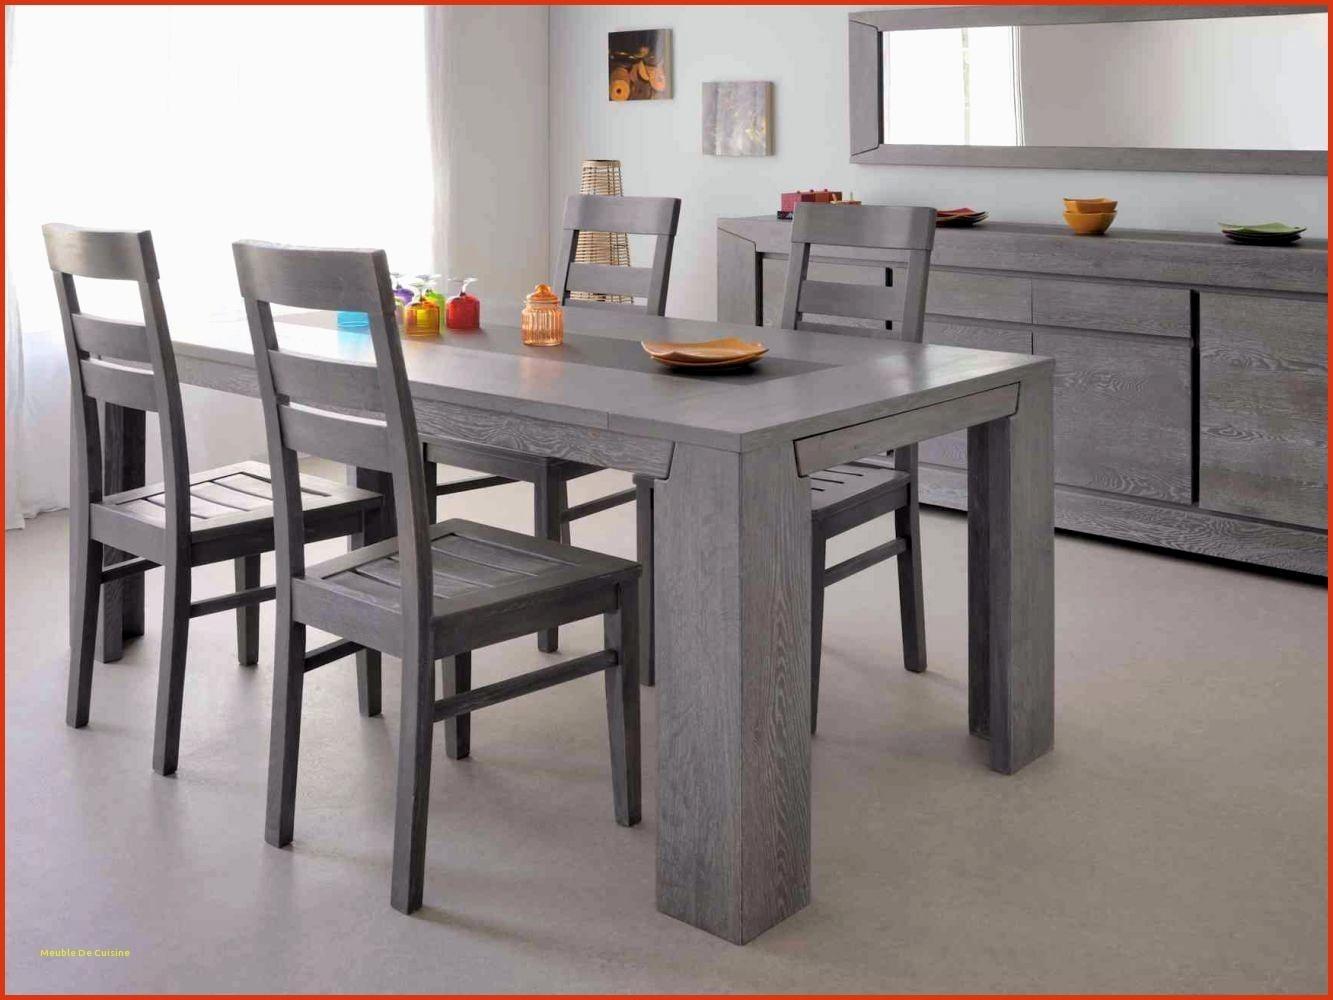 Table Salon Conforama Impressionnant Photos 40 Nouveau Table Salon Conforama